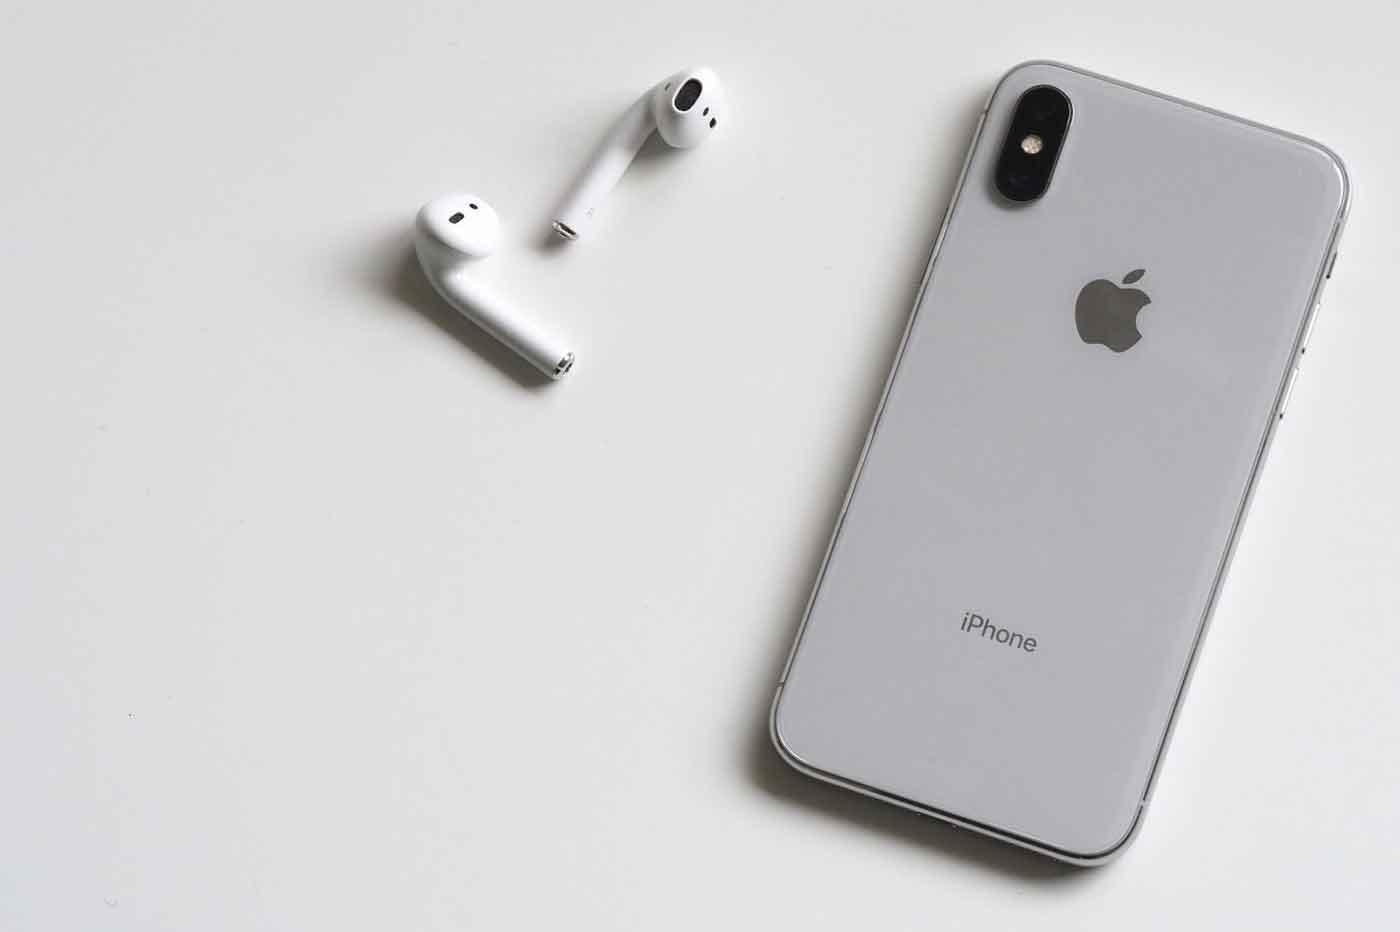 Iphone X com Airpods